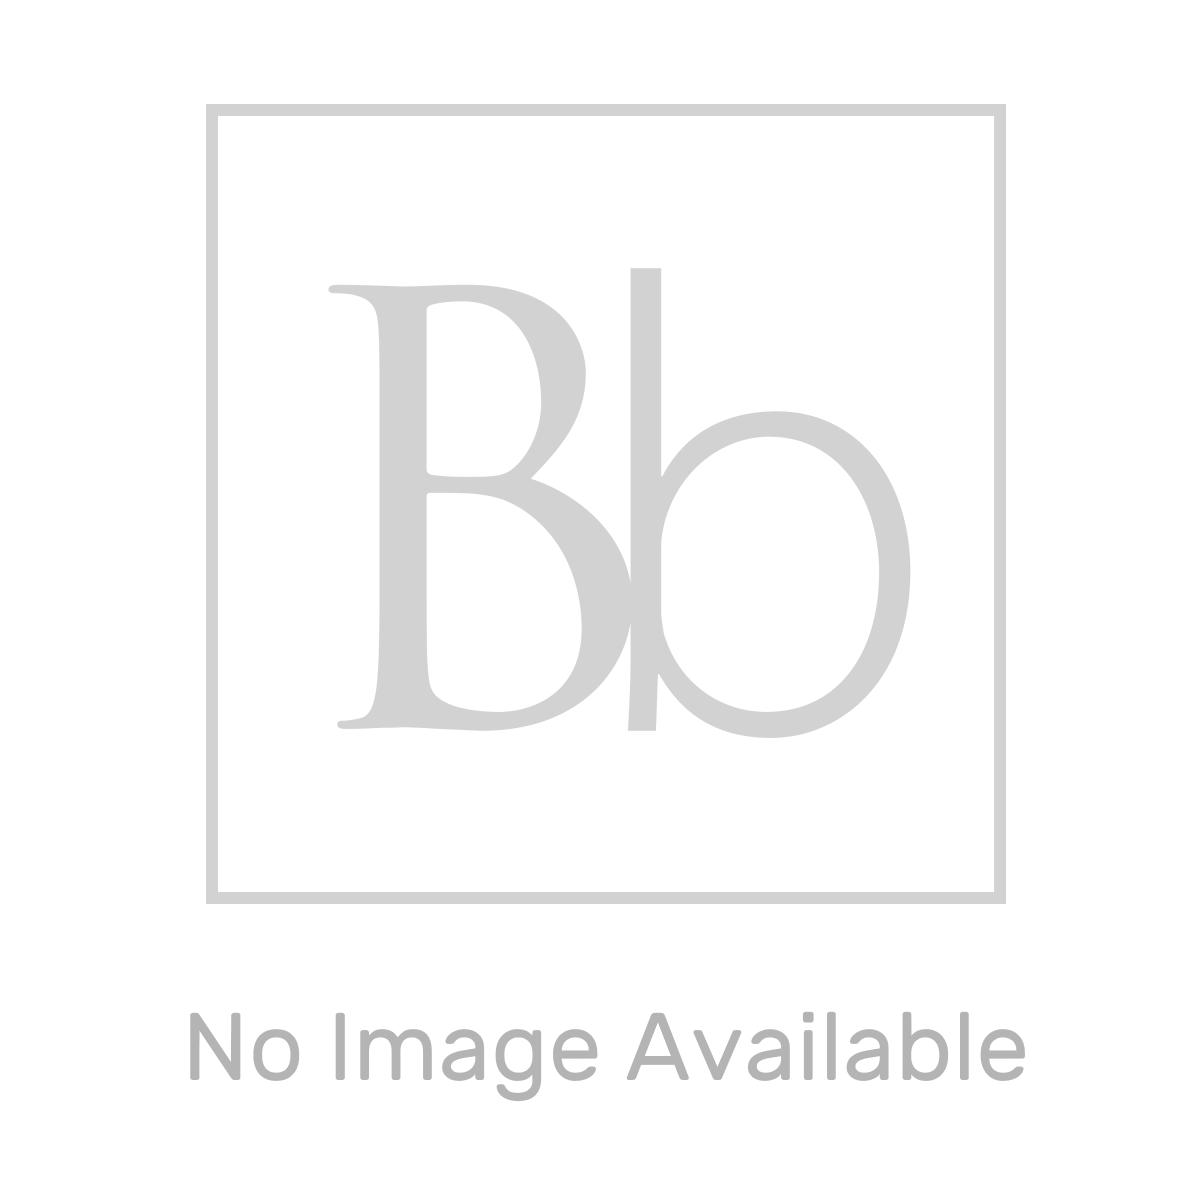 RAK Series 600 Toilet and 400 Series Black Ash Vanity Unit Front